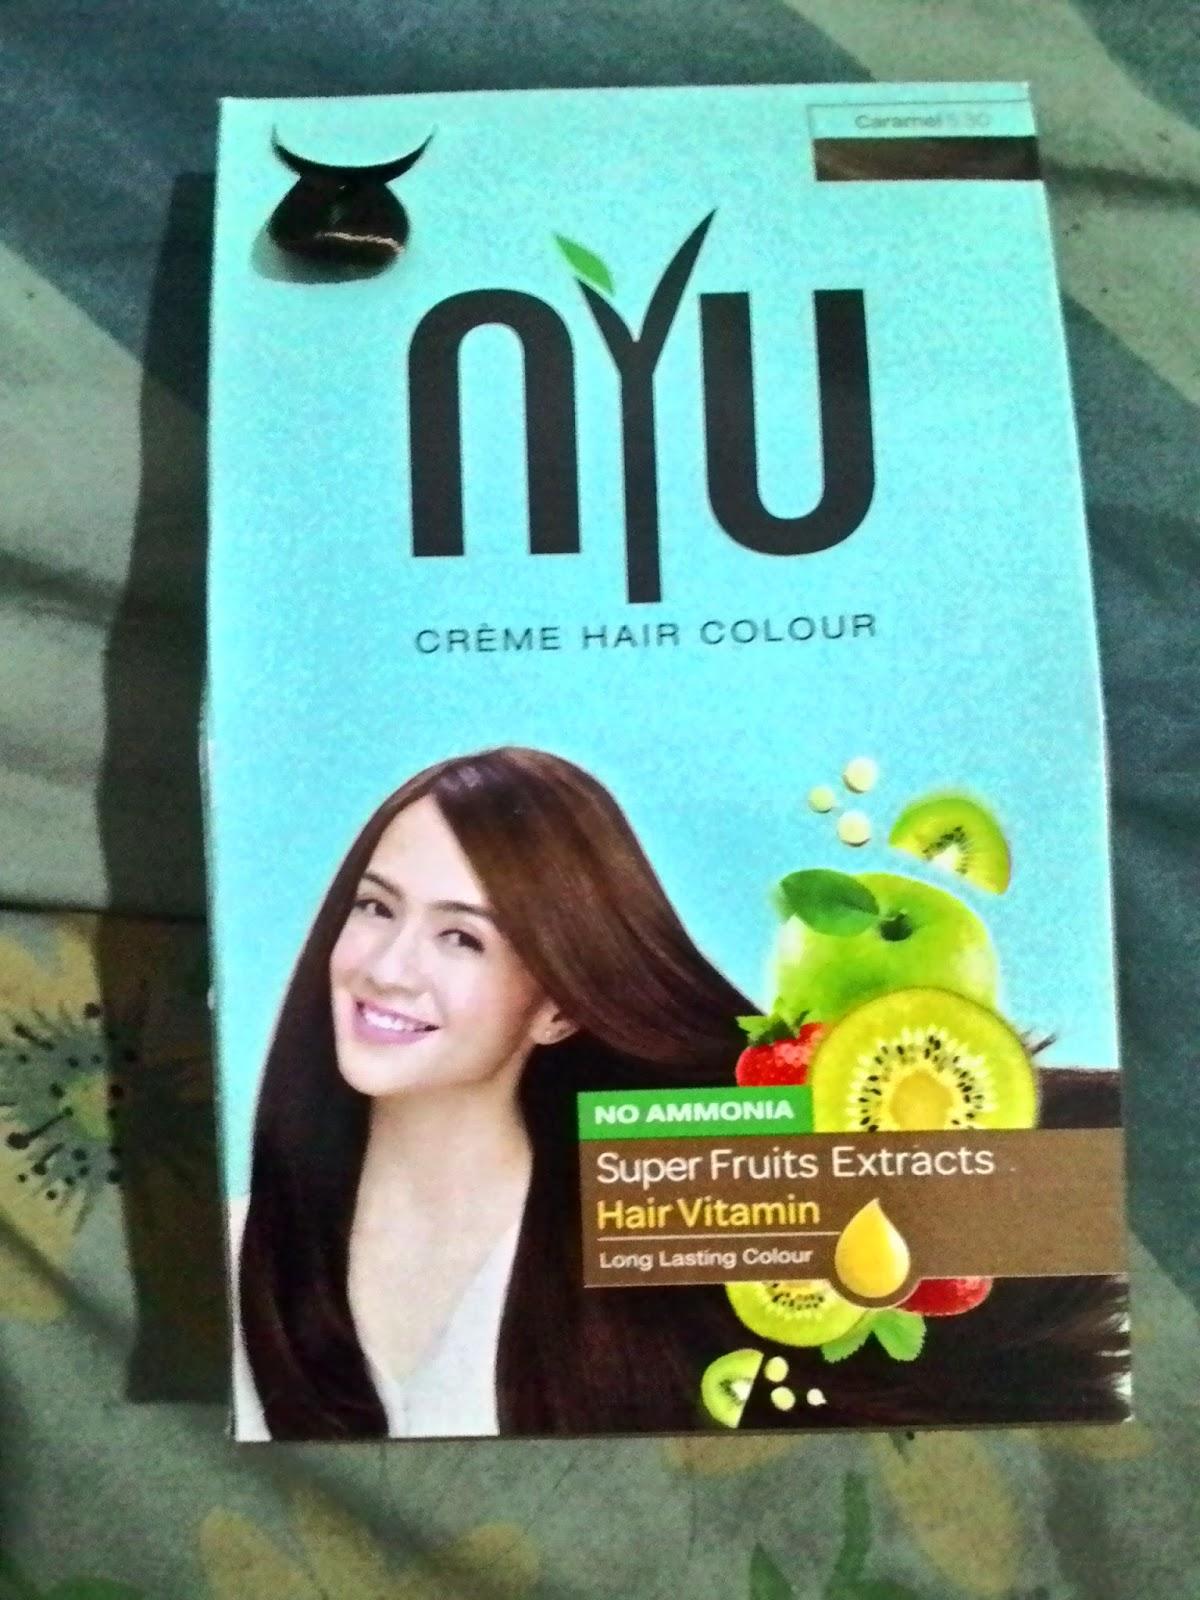 Review NYU Hair Colour Creme Caramel Brown 530 Sho Yumi Blog